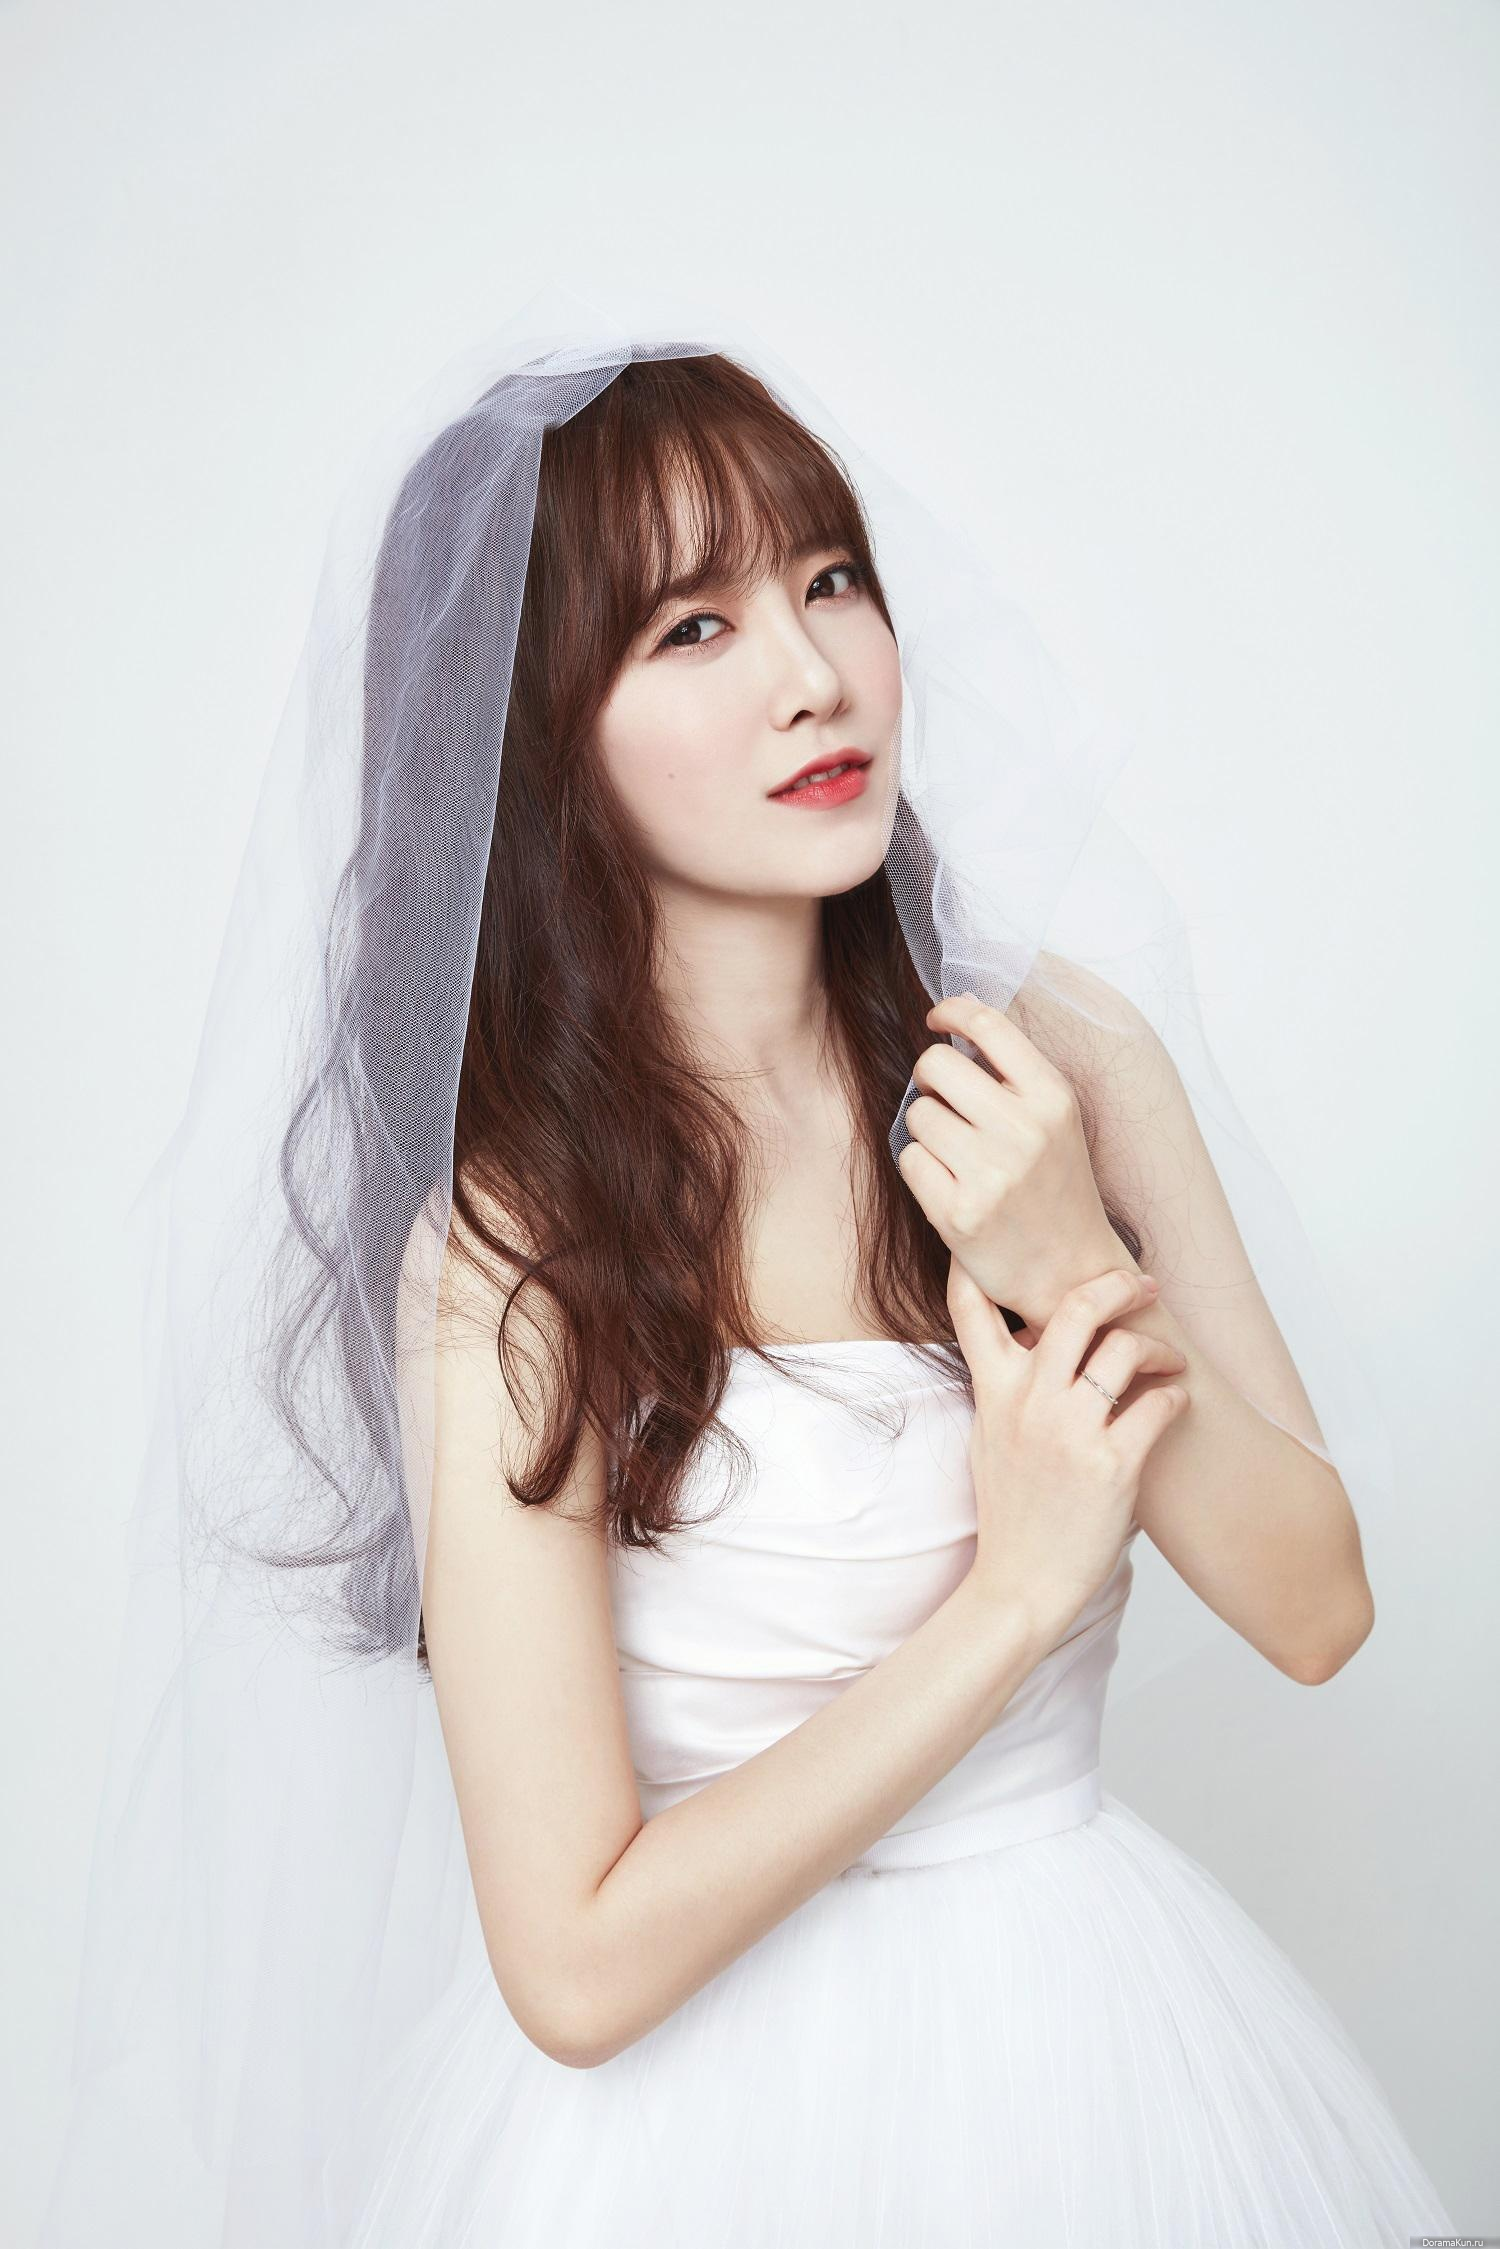 7 Photos of Gu Hye Sun and Ahn Jae Hyun on their wedding day Gu hye sun pictures